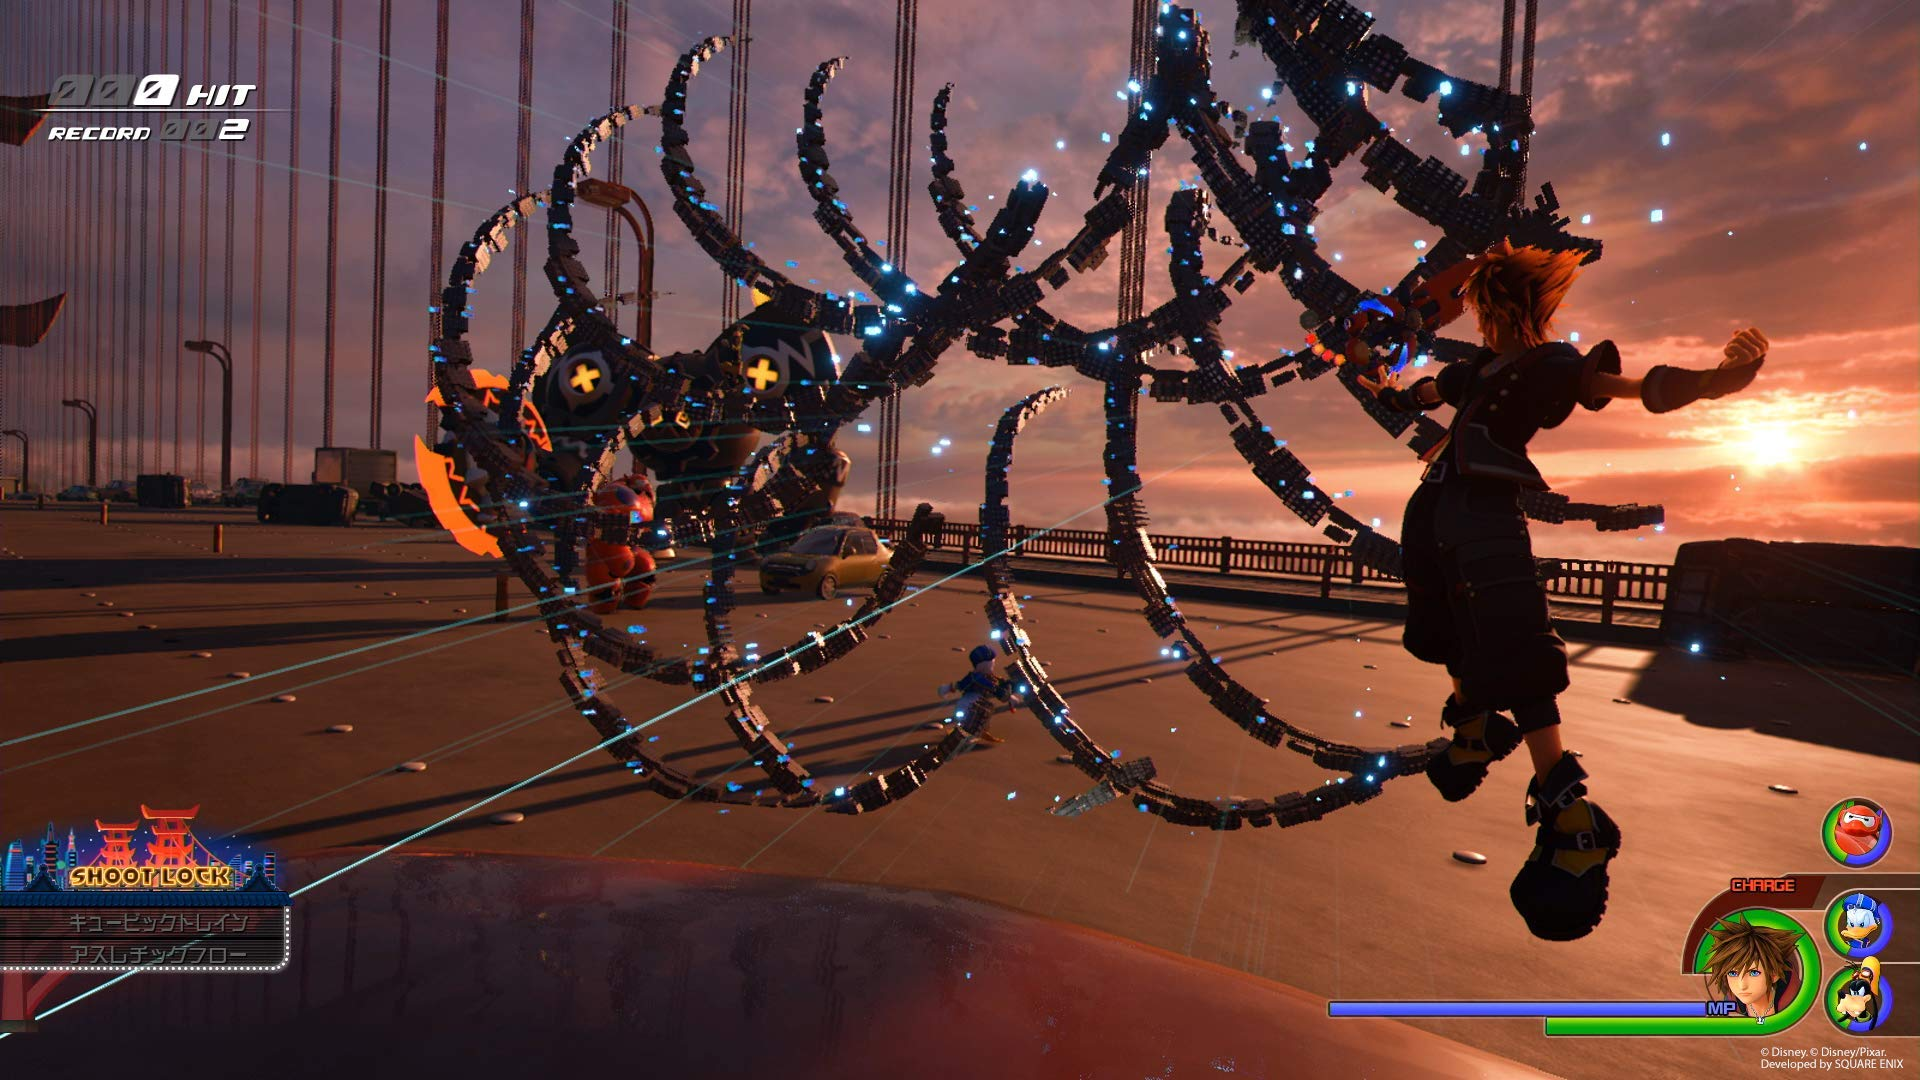 Kingdom Hearts III - Xbox One by Square Enix (Image #26)